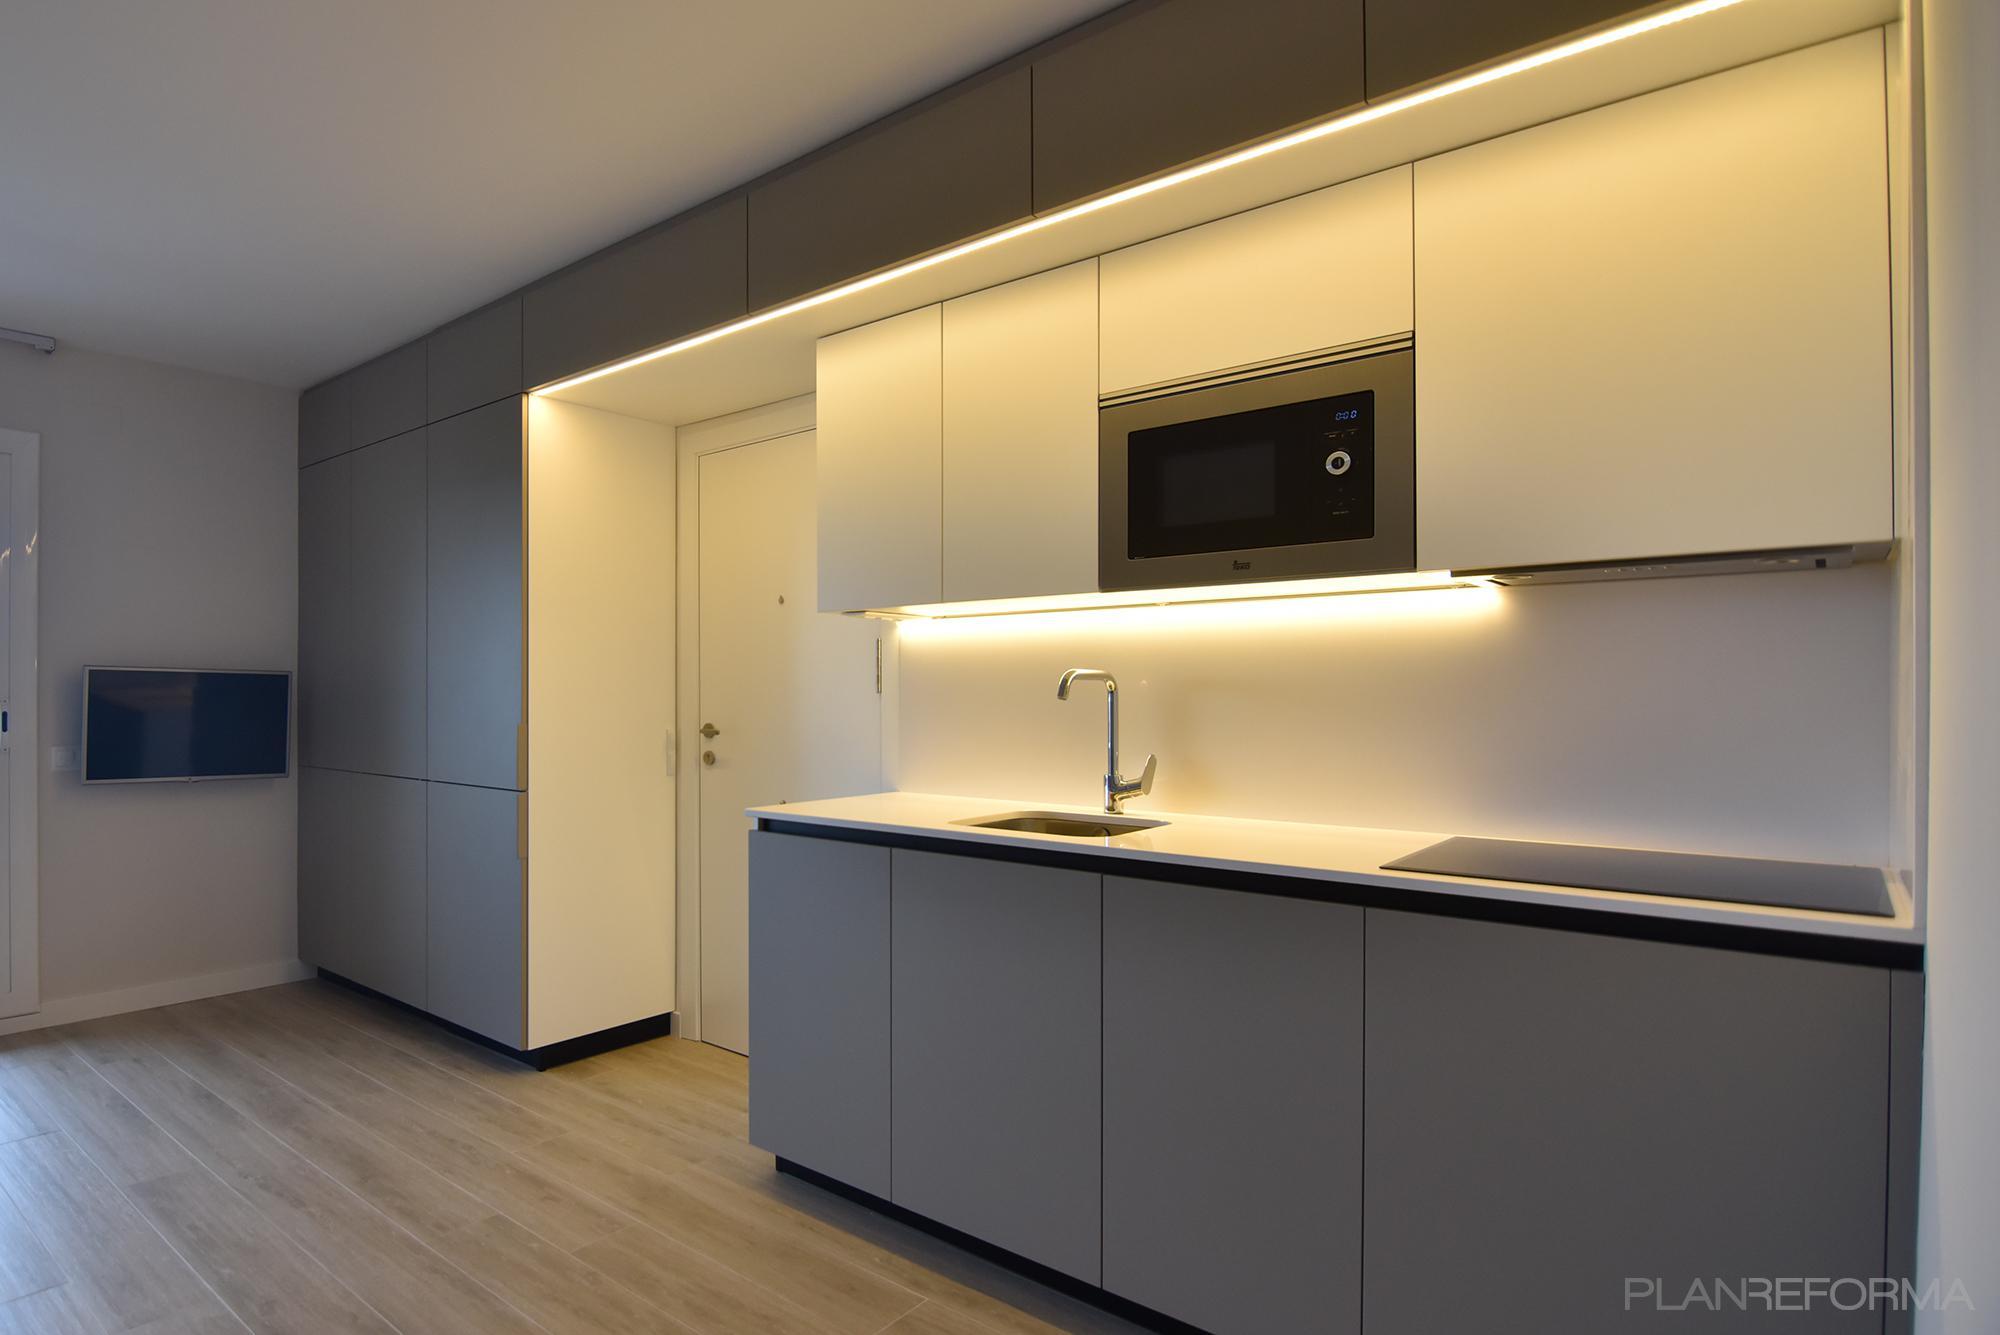 Recibidor cocina lavadero estilo moderno color marron for Cocinas estilo moderno